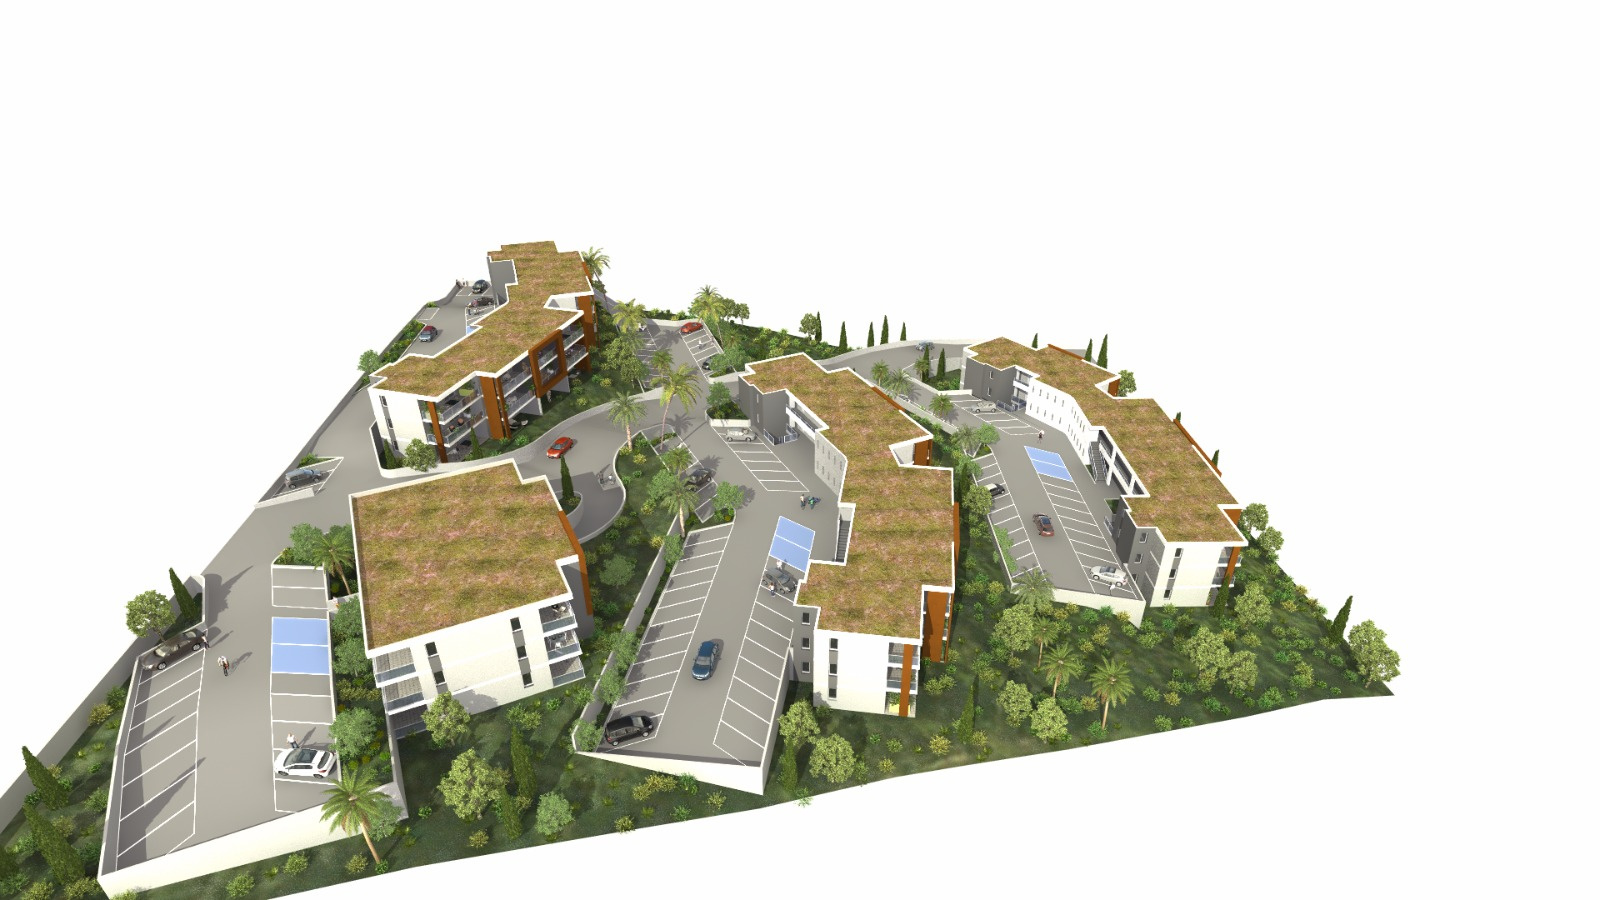 Les rivages de stagnola Porticcio T2 3D maquette